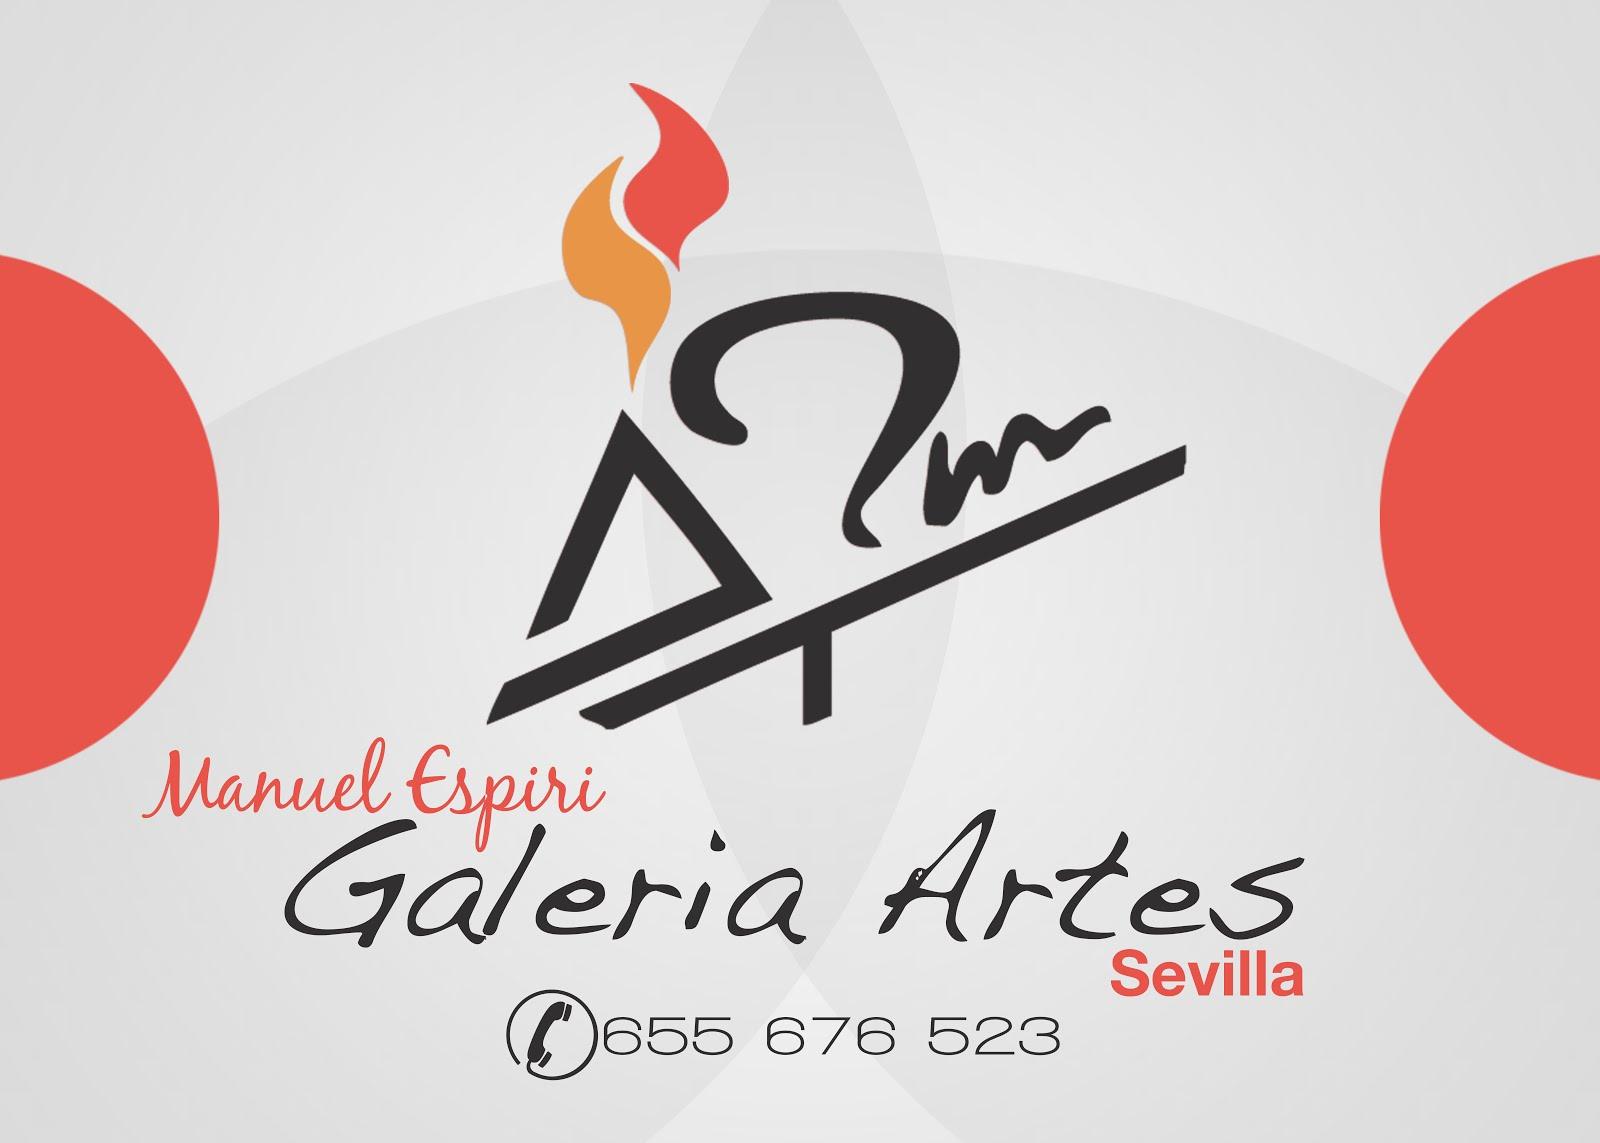 Galeria Arte Esculturas en Sevilla